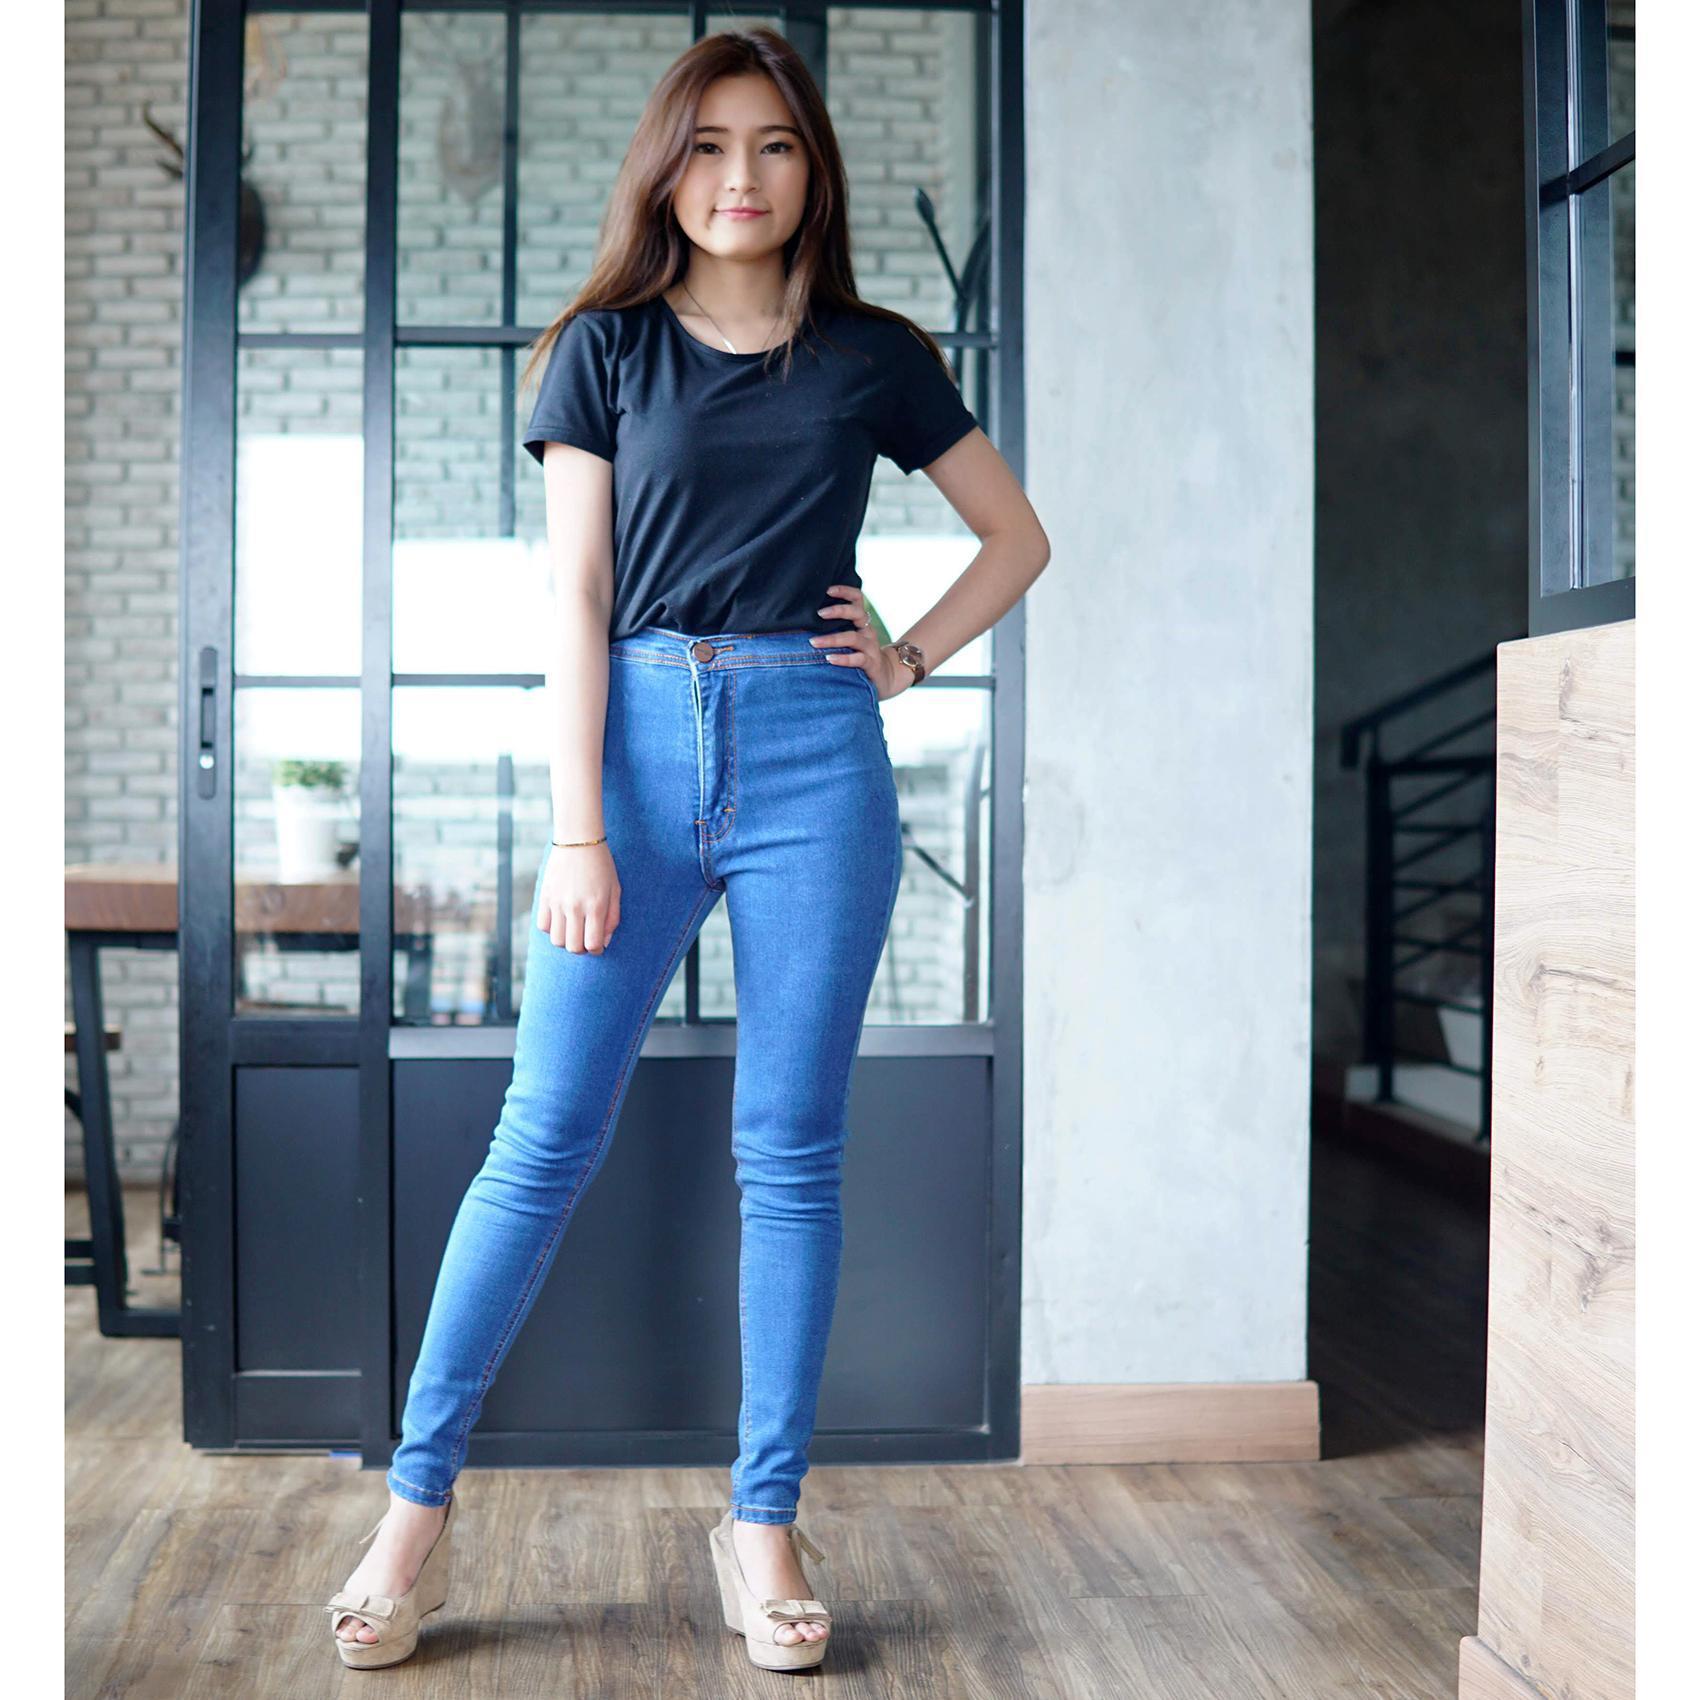 Labelledesign MASTER JEANS celana jeans highwaist wanita BAGUS kwalitas premium PROMO